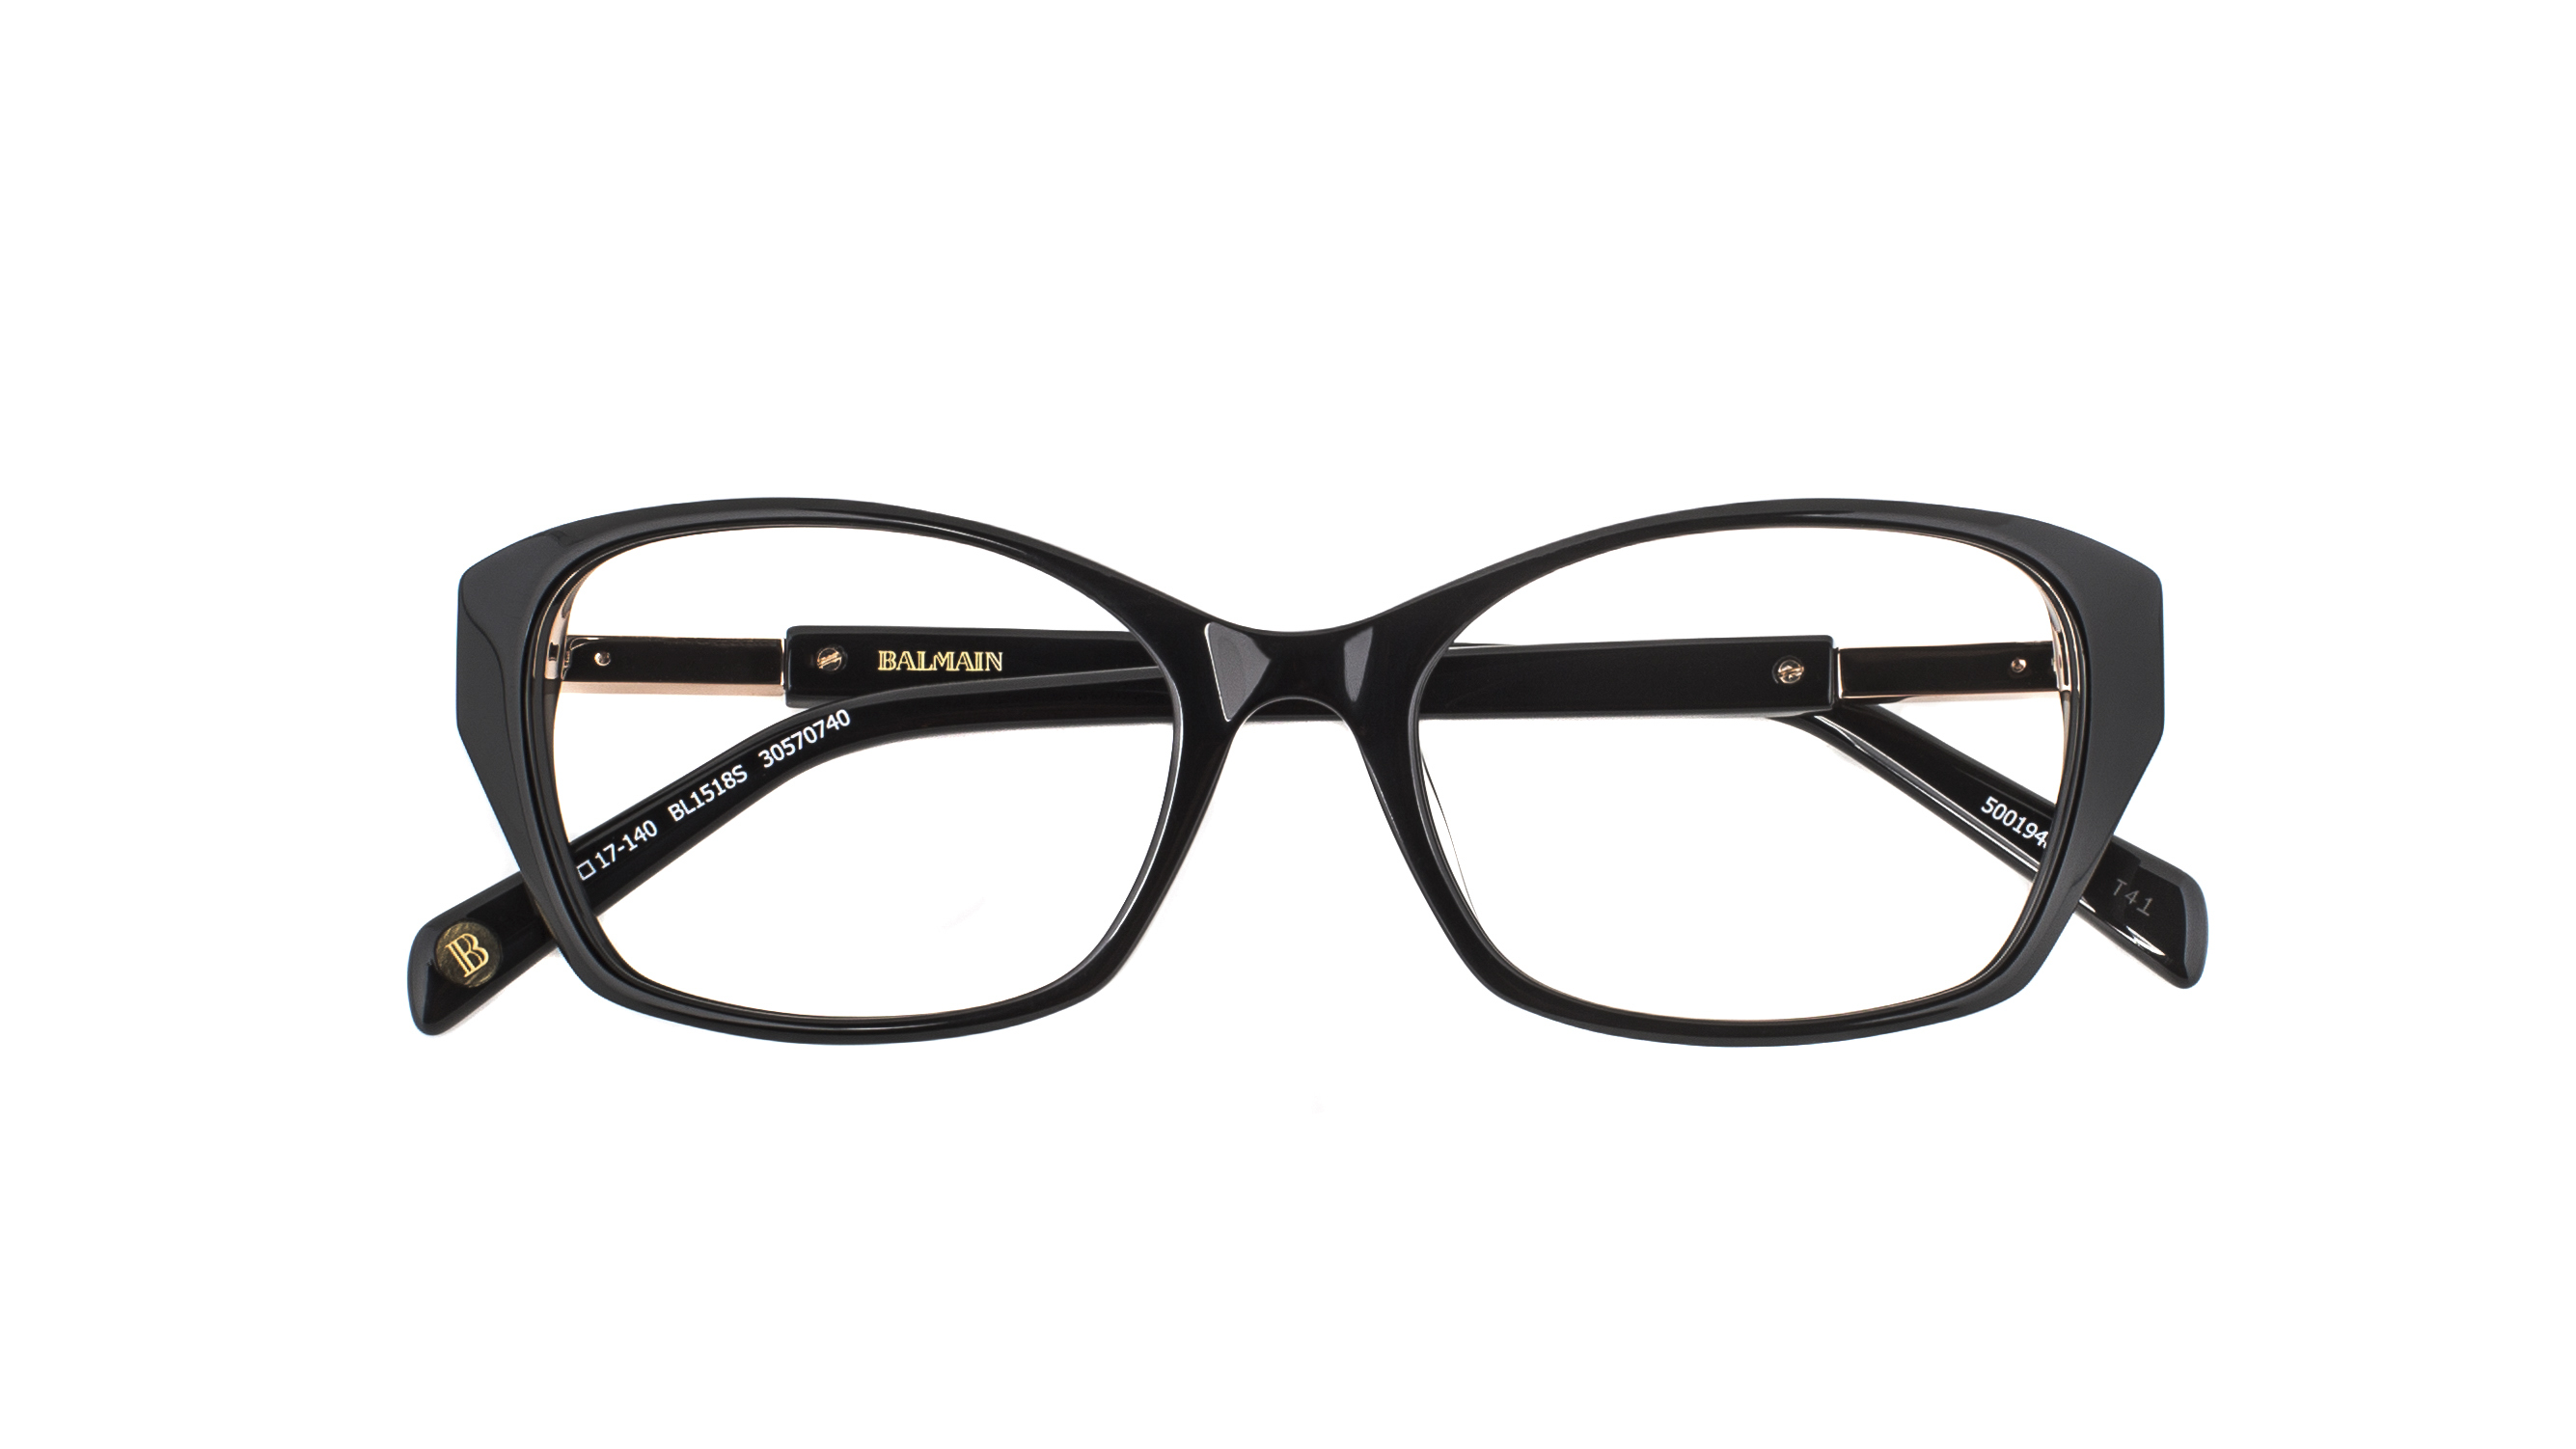 Balmain x Specsavers BL1518S 30570740 - RRP 2 pairs single vision $459 (2)